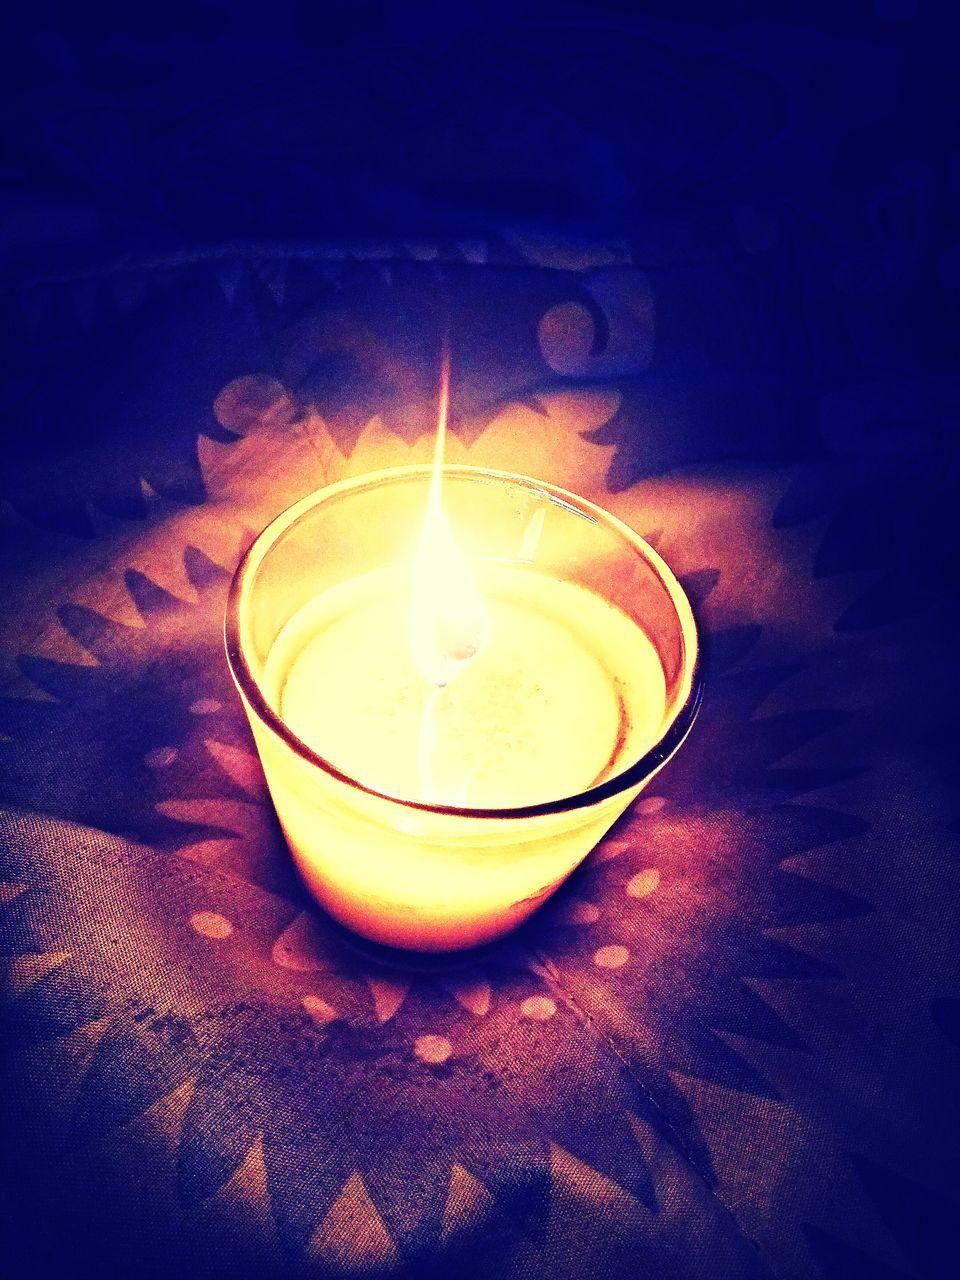 flame, candle, burning, illuminated, glowing, heat - temperature, indoors, lighting equipment, no people, tea light, night, close-up